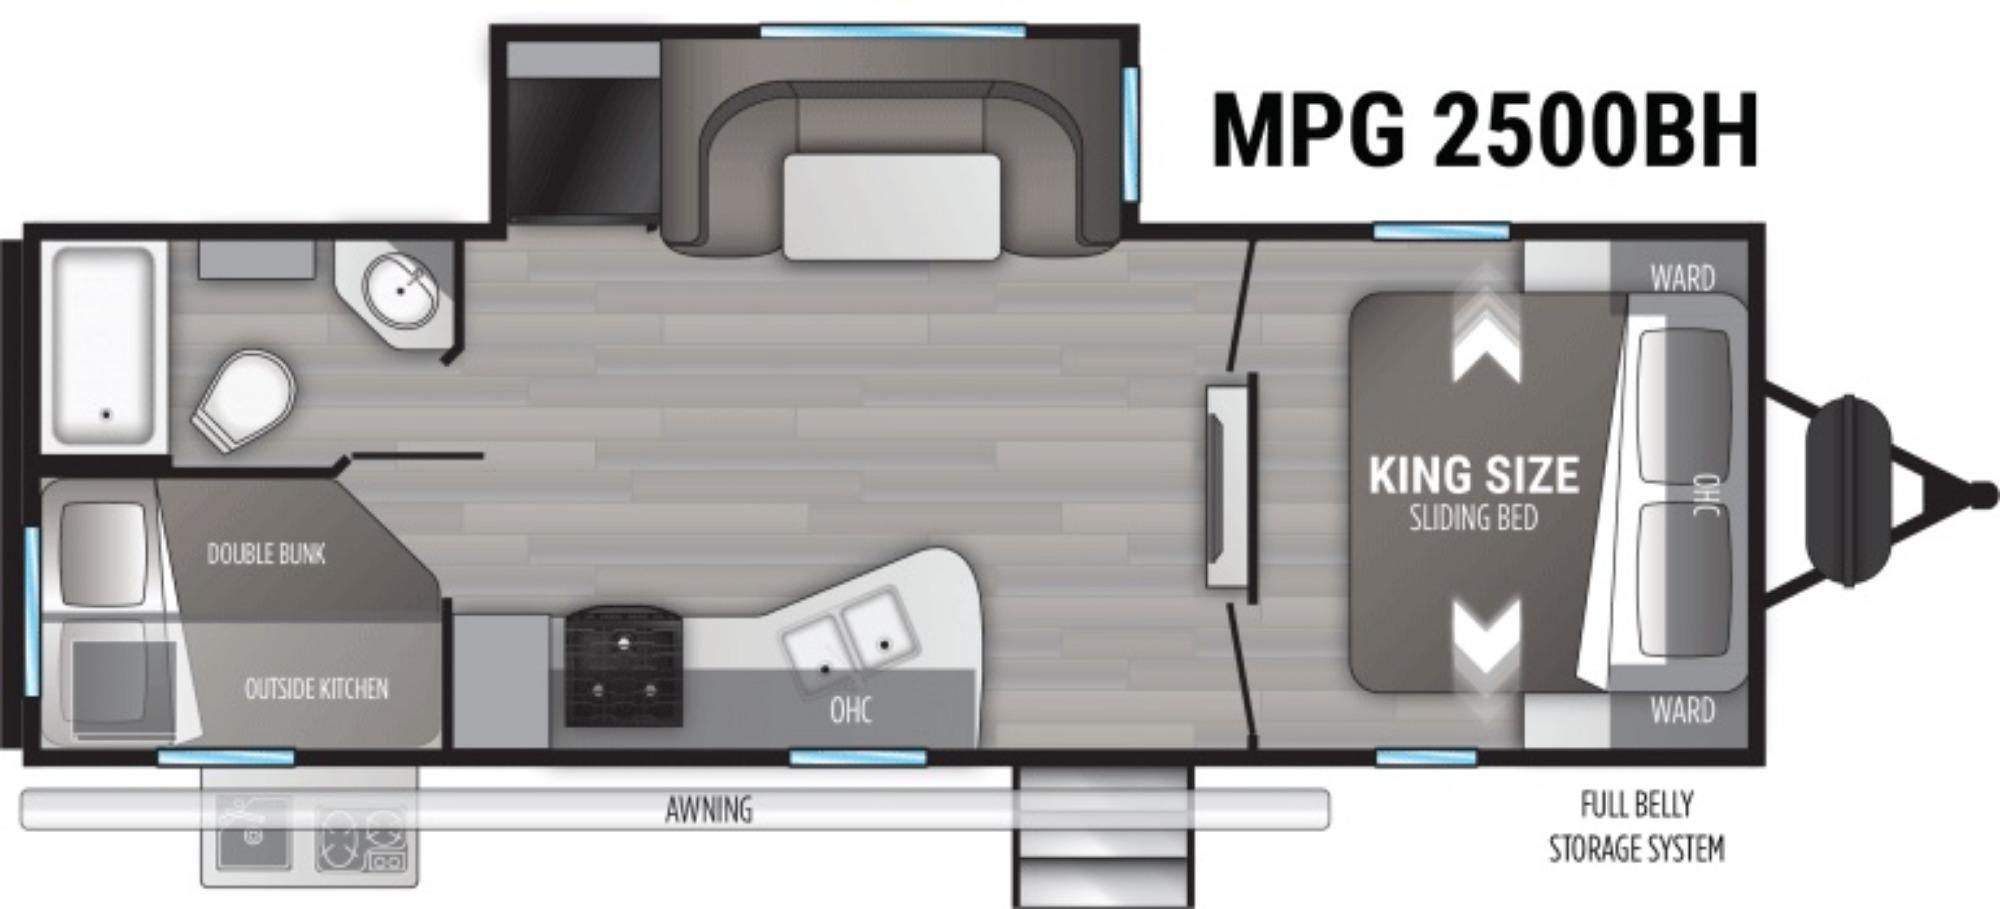 View Floor Plan for 2022 CRUISER RV MPG 2500BH